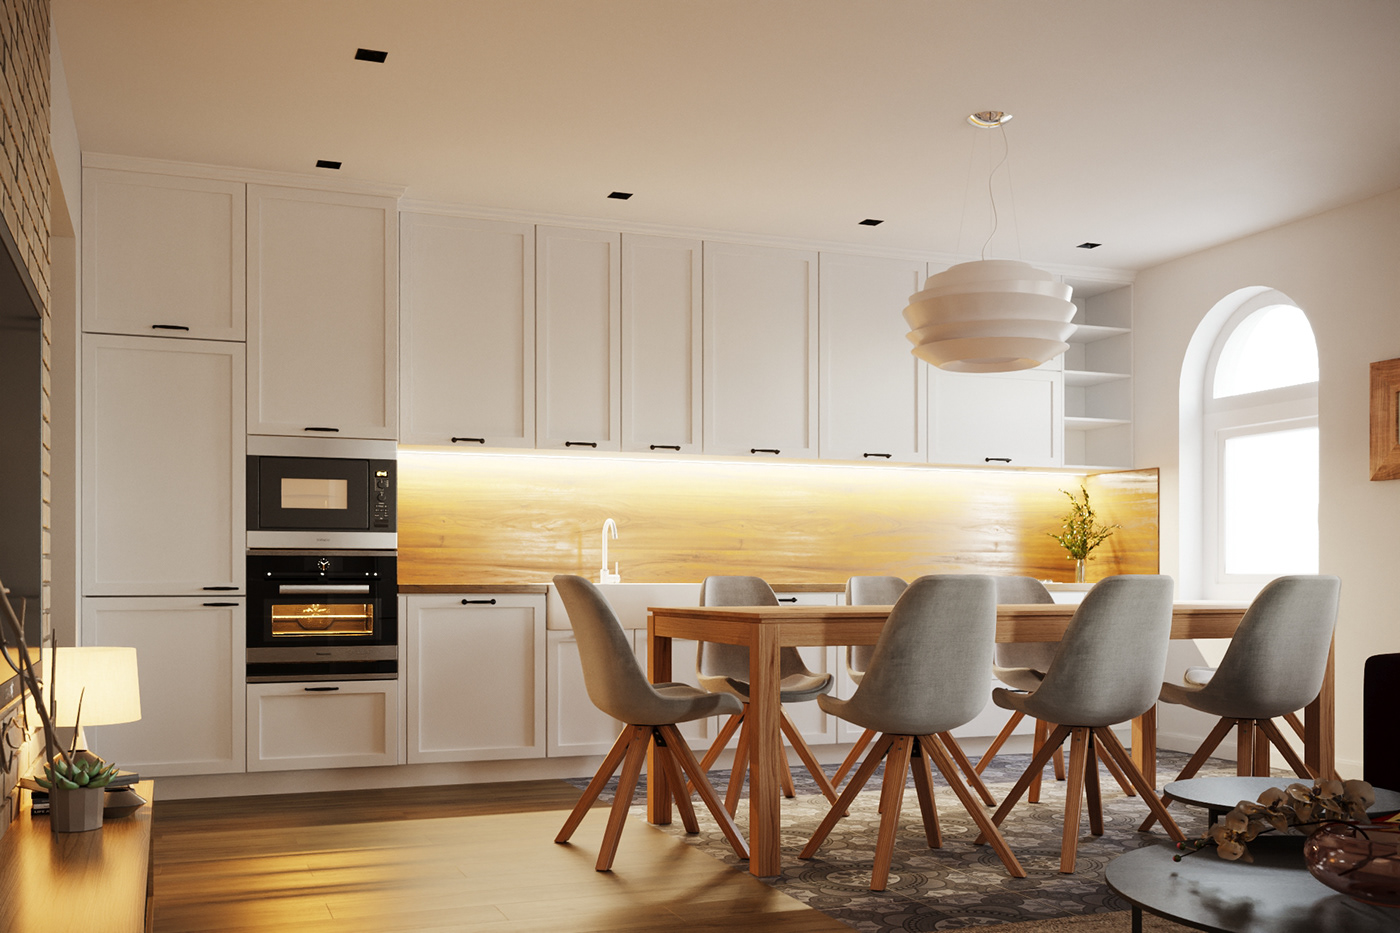 architecture archviz CGI corona render  Interior interior design  kitchen living room Render visualization